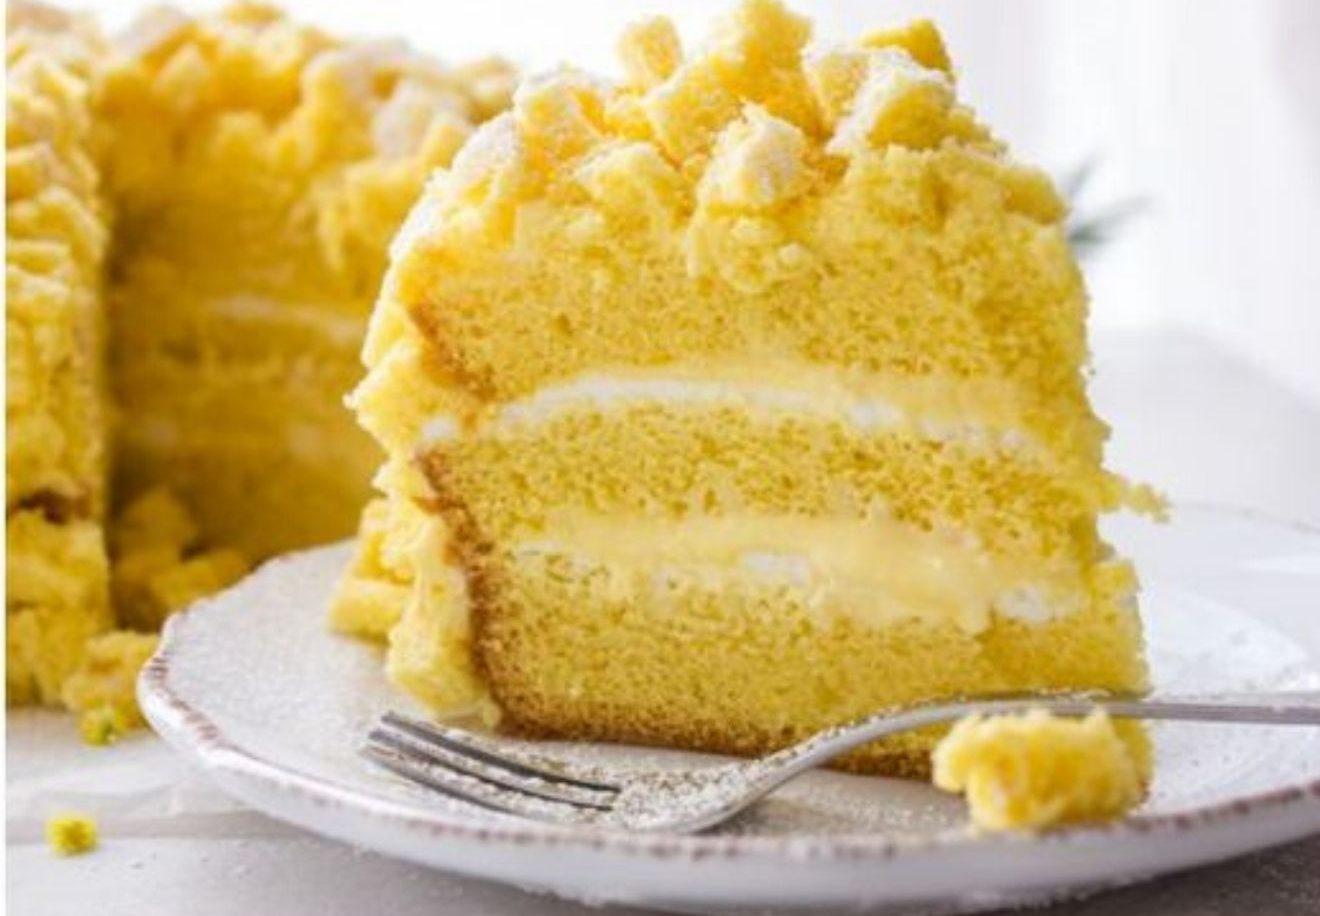 torta mimosa all'ananas ricetta originale